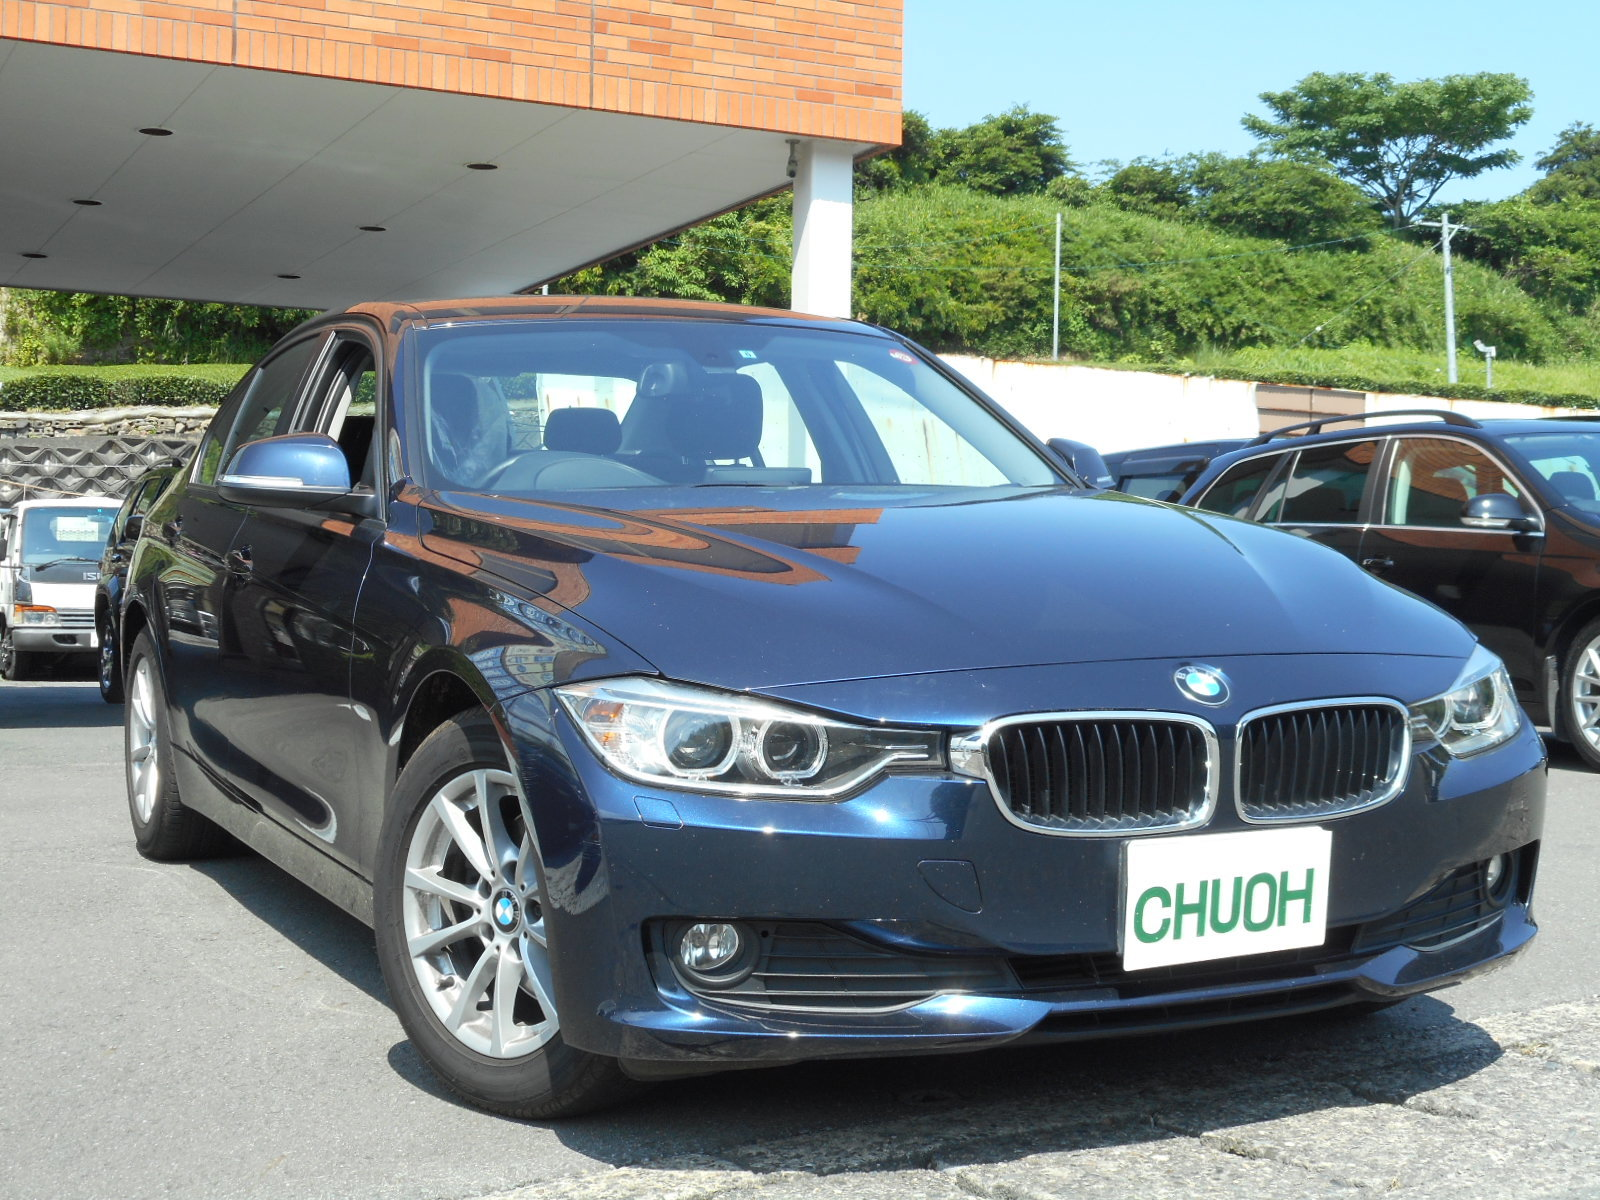 BMW 320d入りました!_c0267693_17521699.jpg